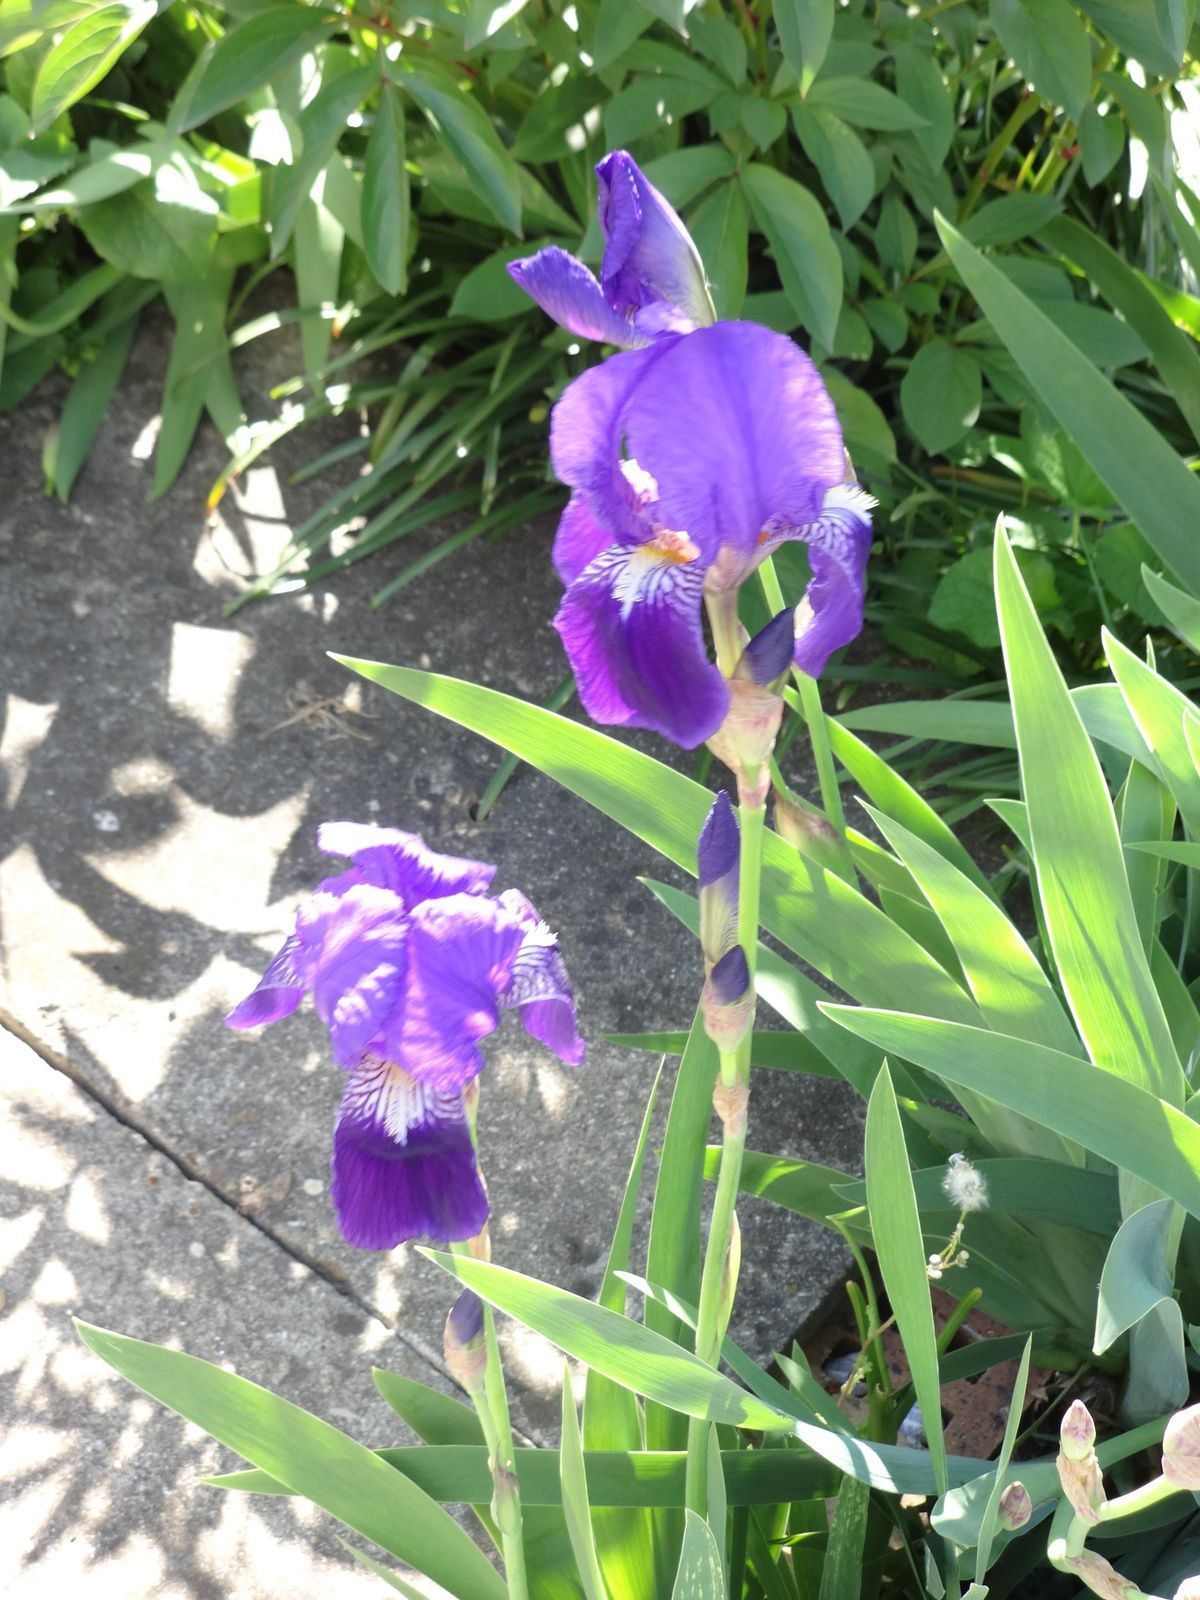 Lundi Soleil : Violet